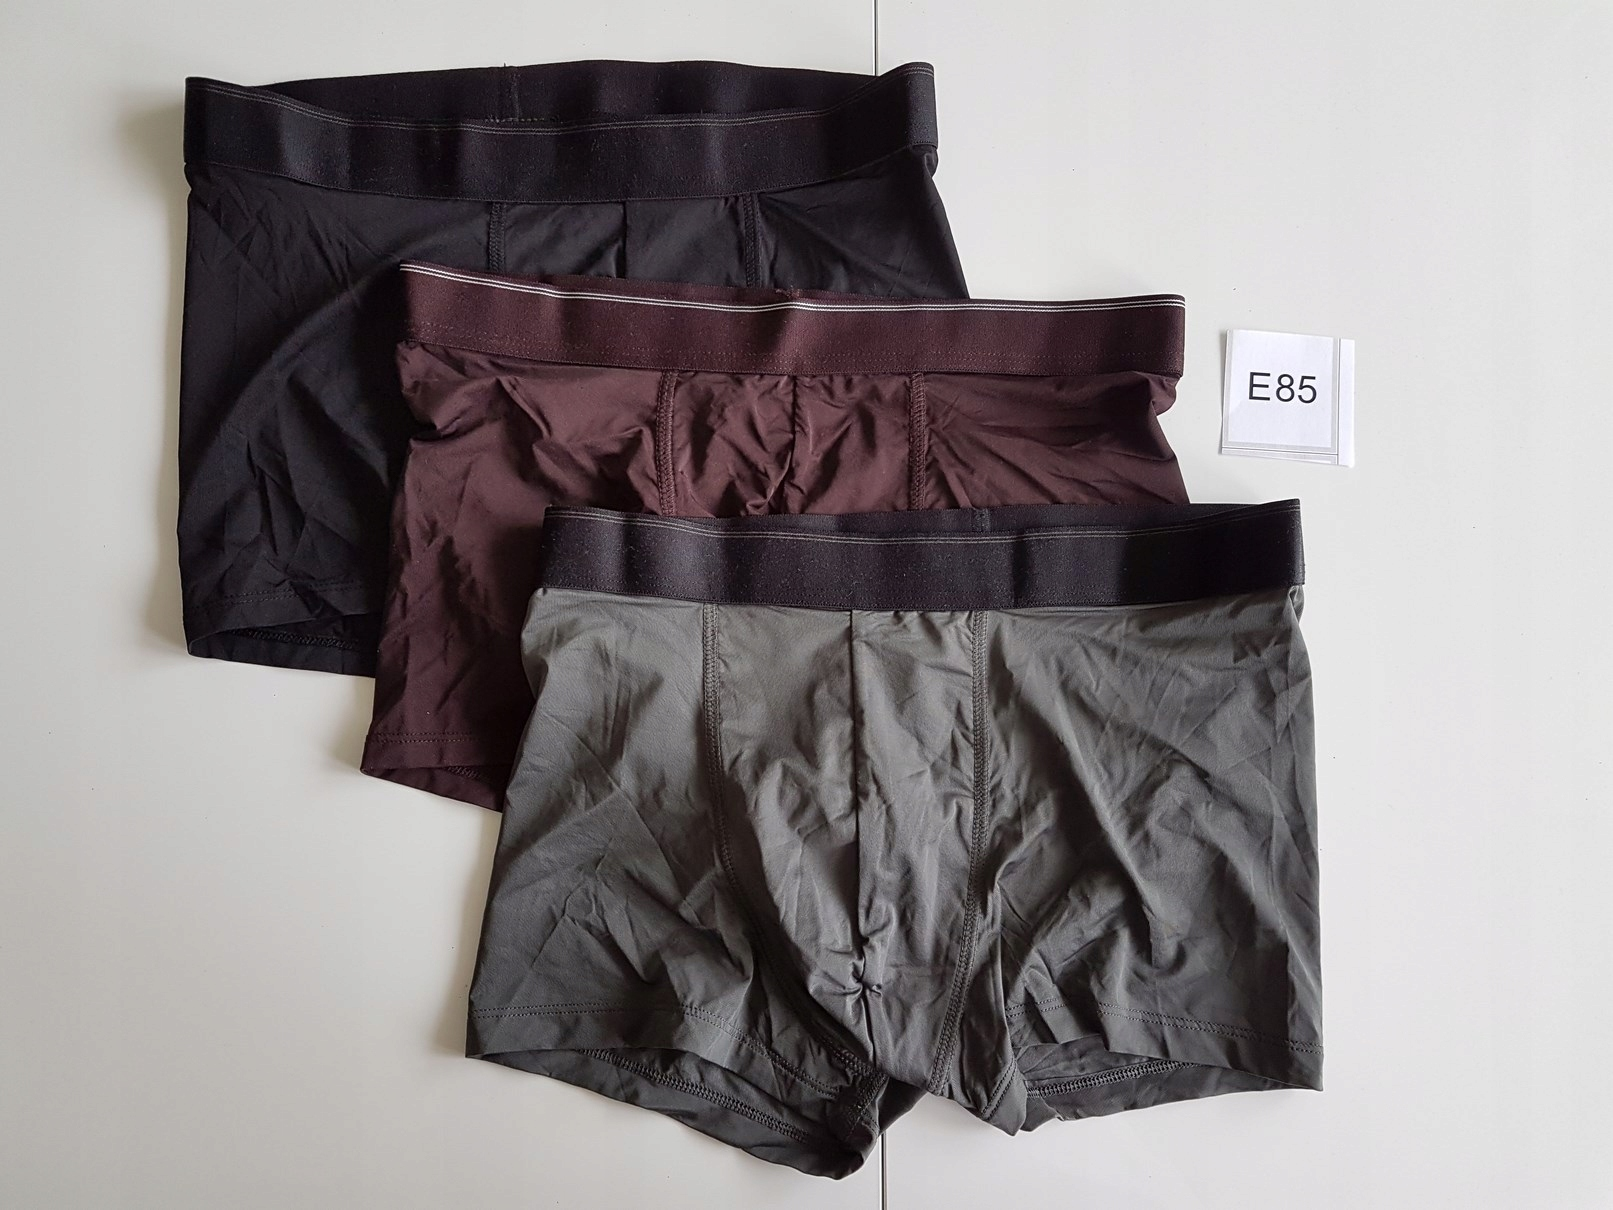 BOKSERKI majtki H&M rozm: M 3-pak E85